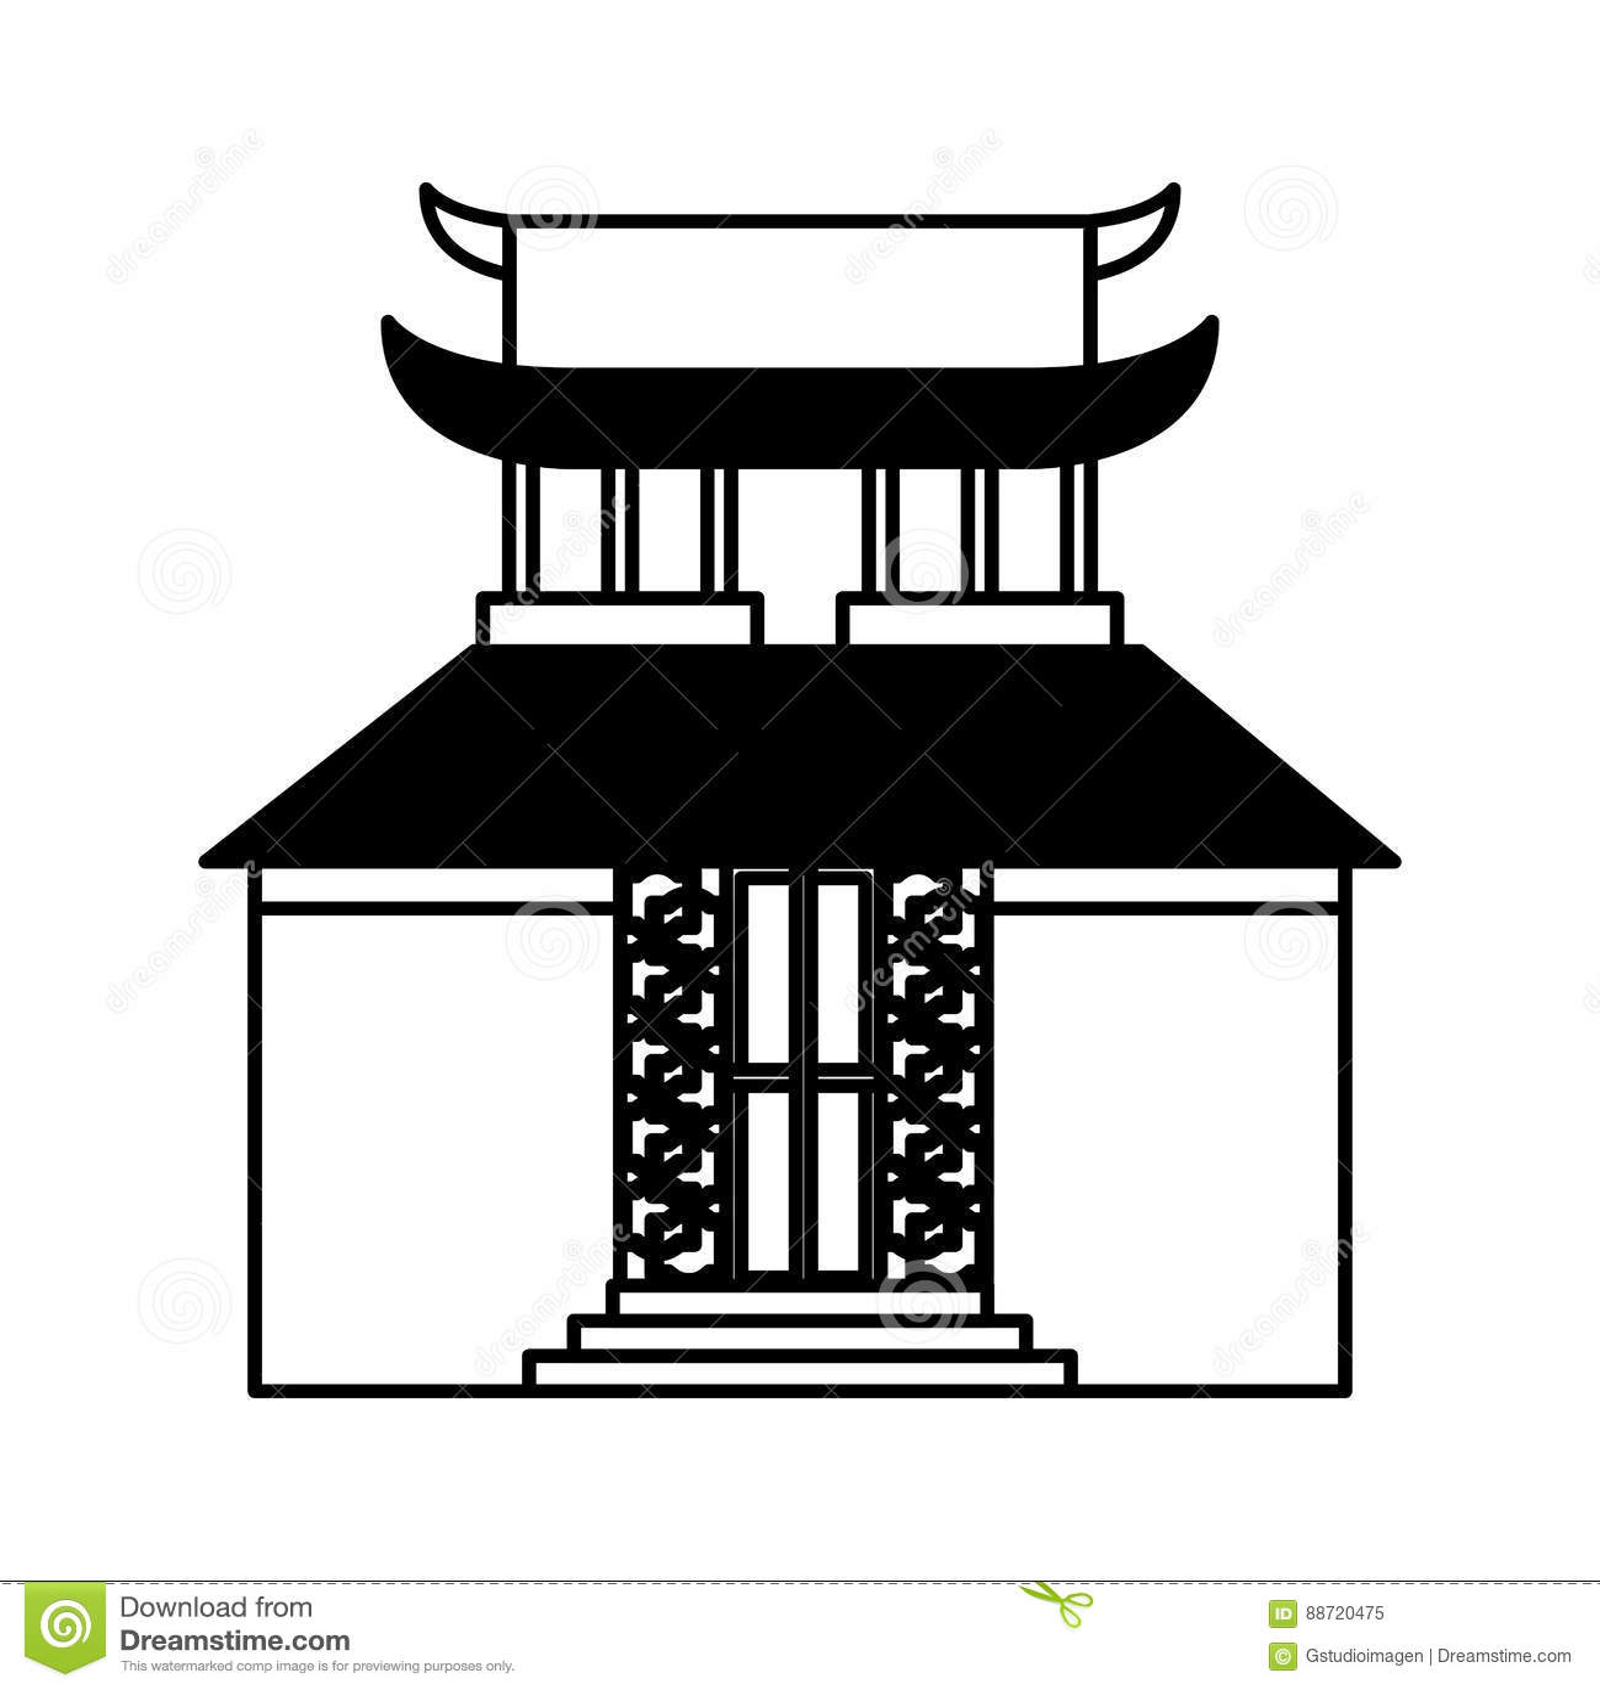 asian building castle icon stock vector - image: 88720475